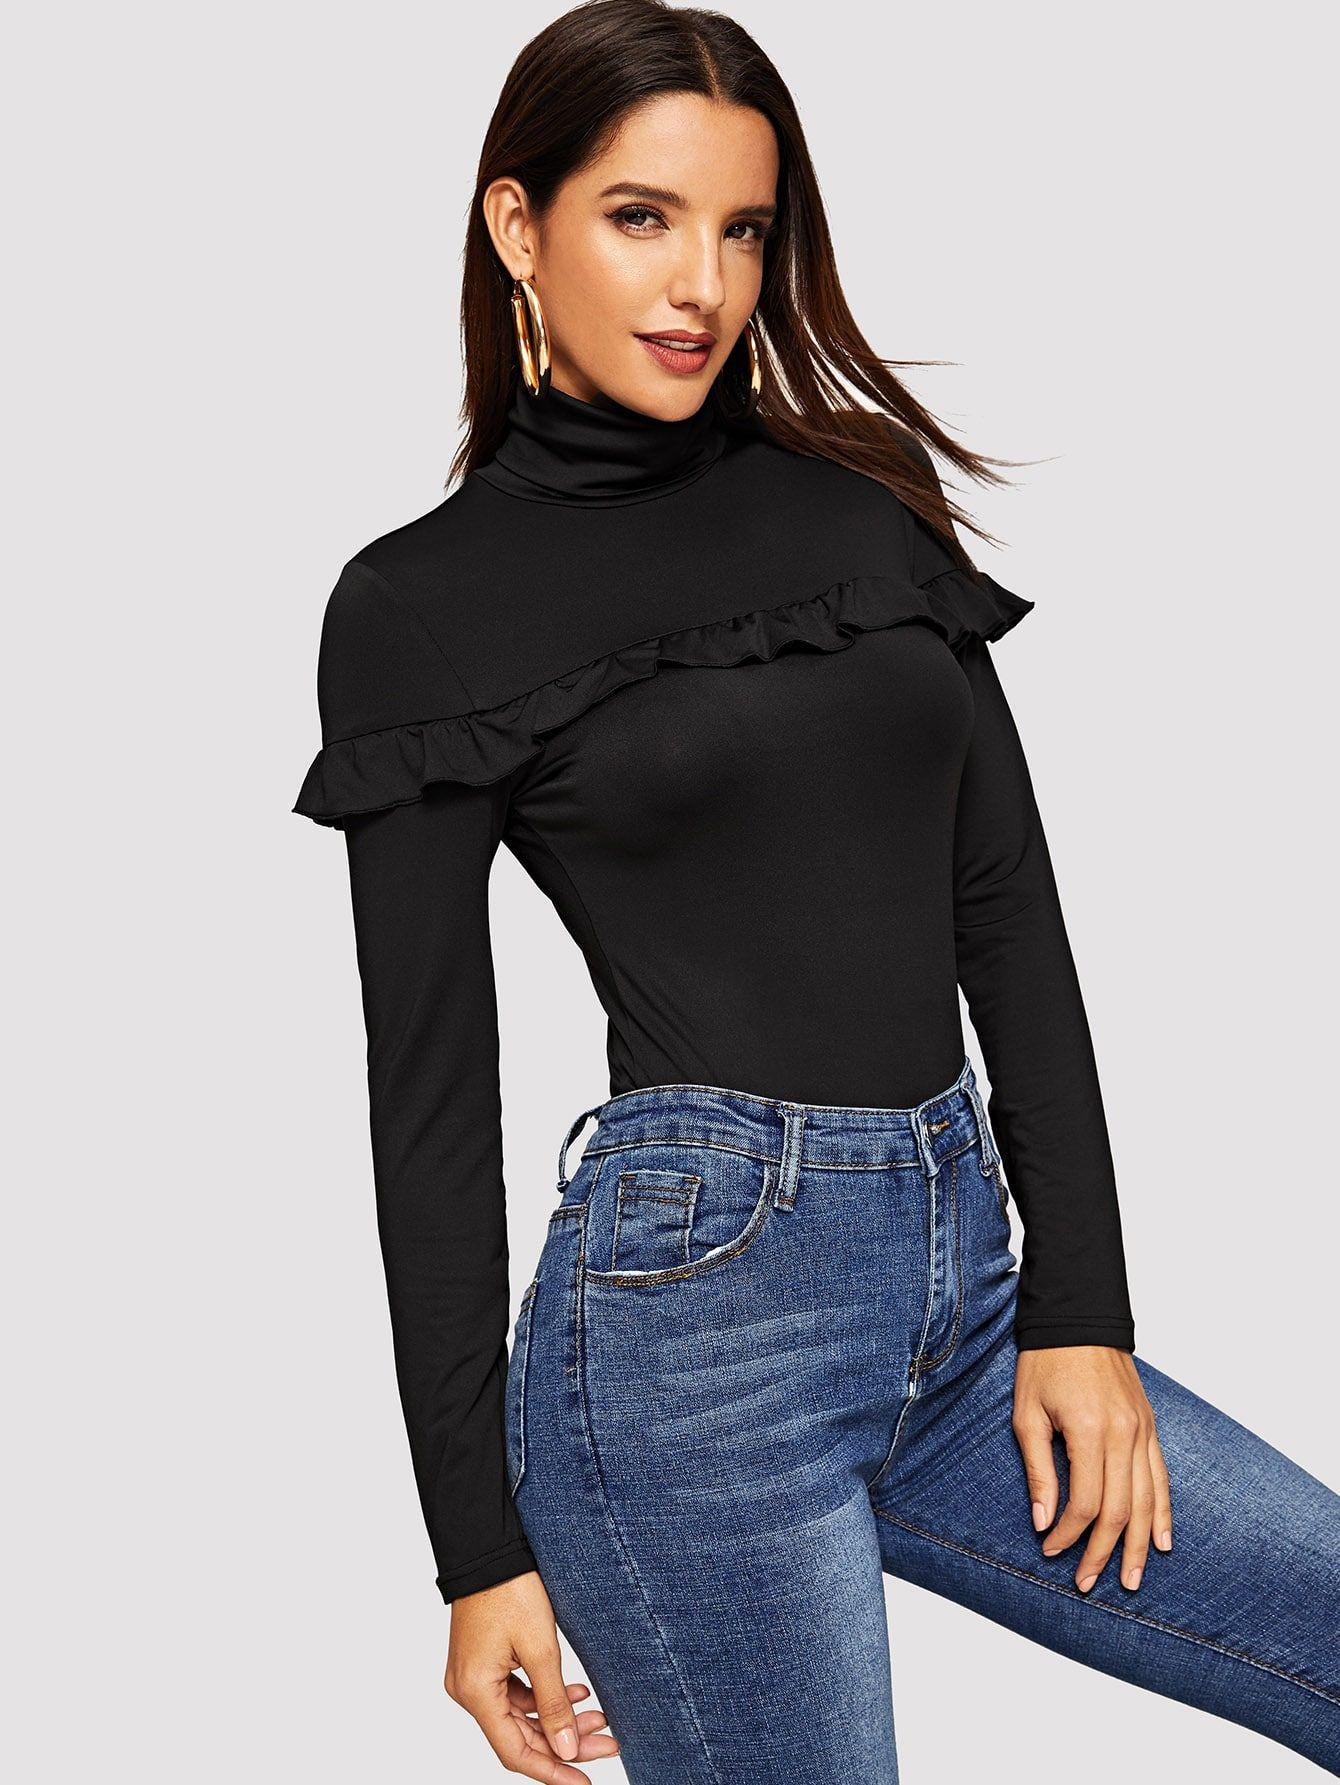 3dcd22c9895 Elegant Ruffle Plain Regular Fit High Neck Long Sleeve Black Regular Length  Turtleneck Ruffle Form Fitted Tee